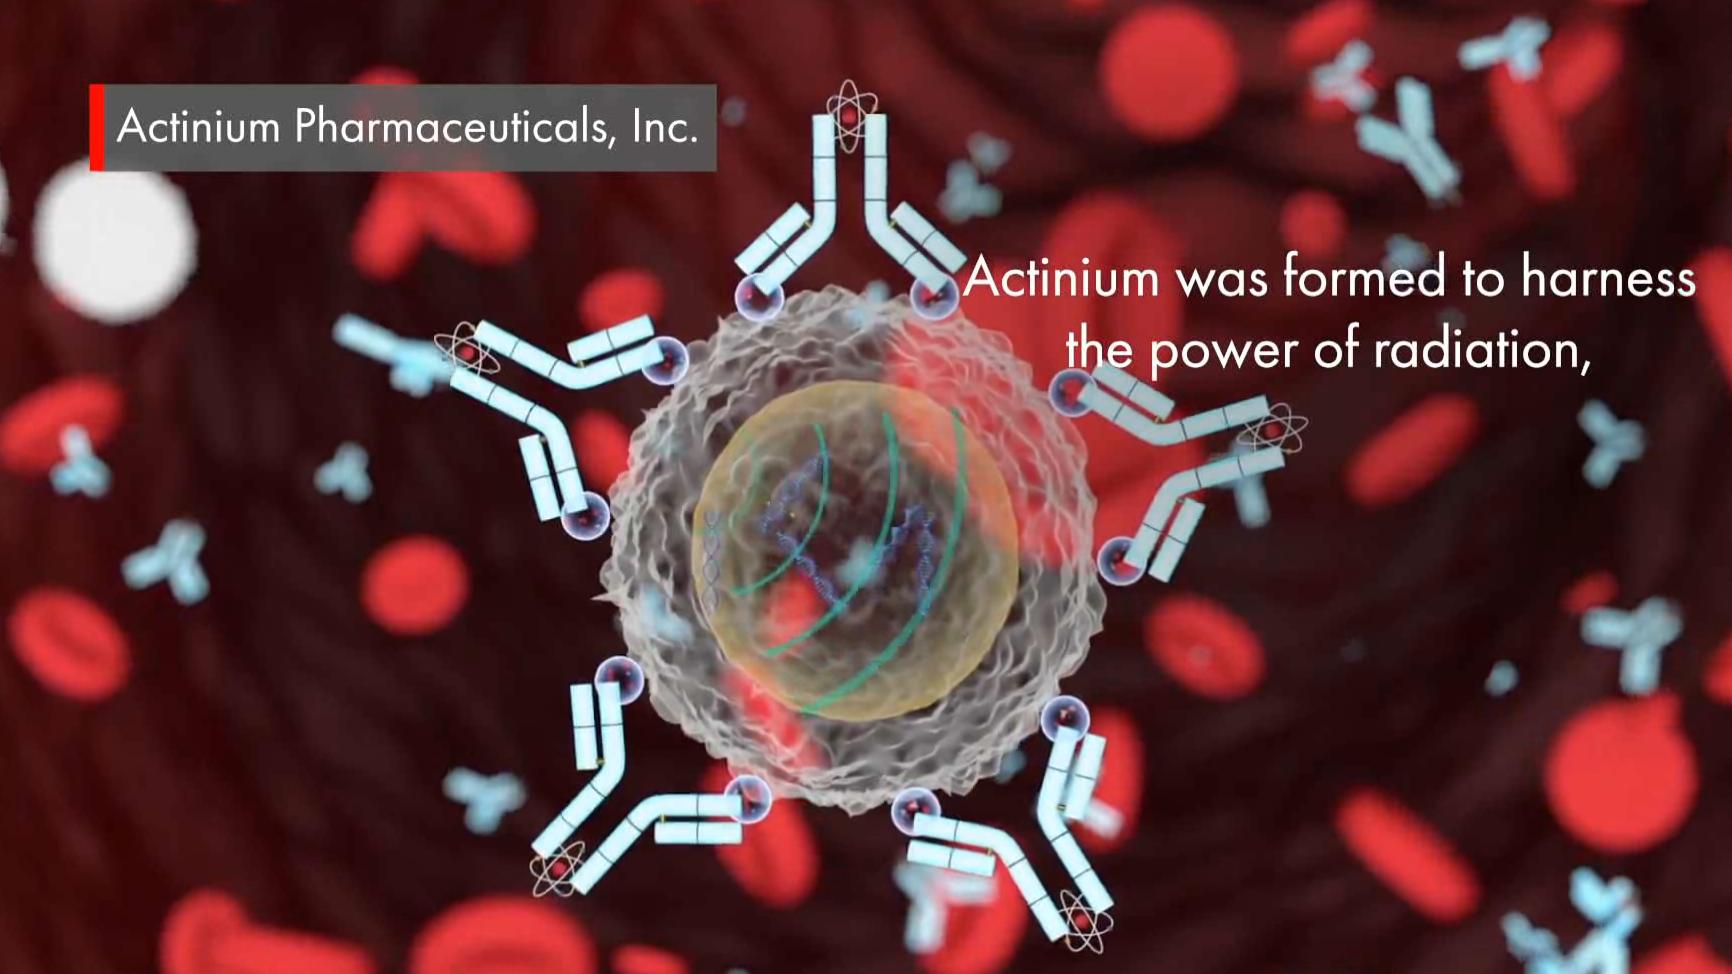 Actinium Pharmaceuticals – Harnessing the Power of Radiation